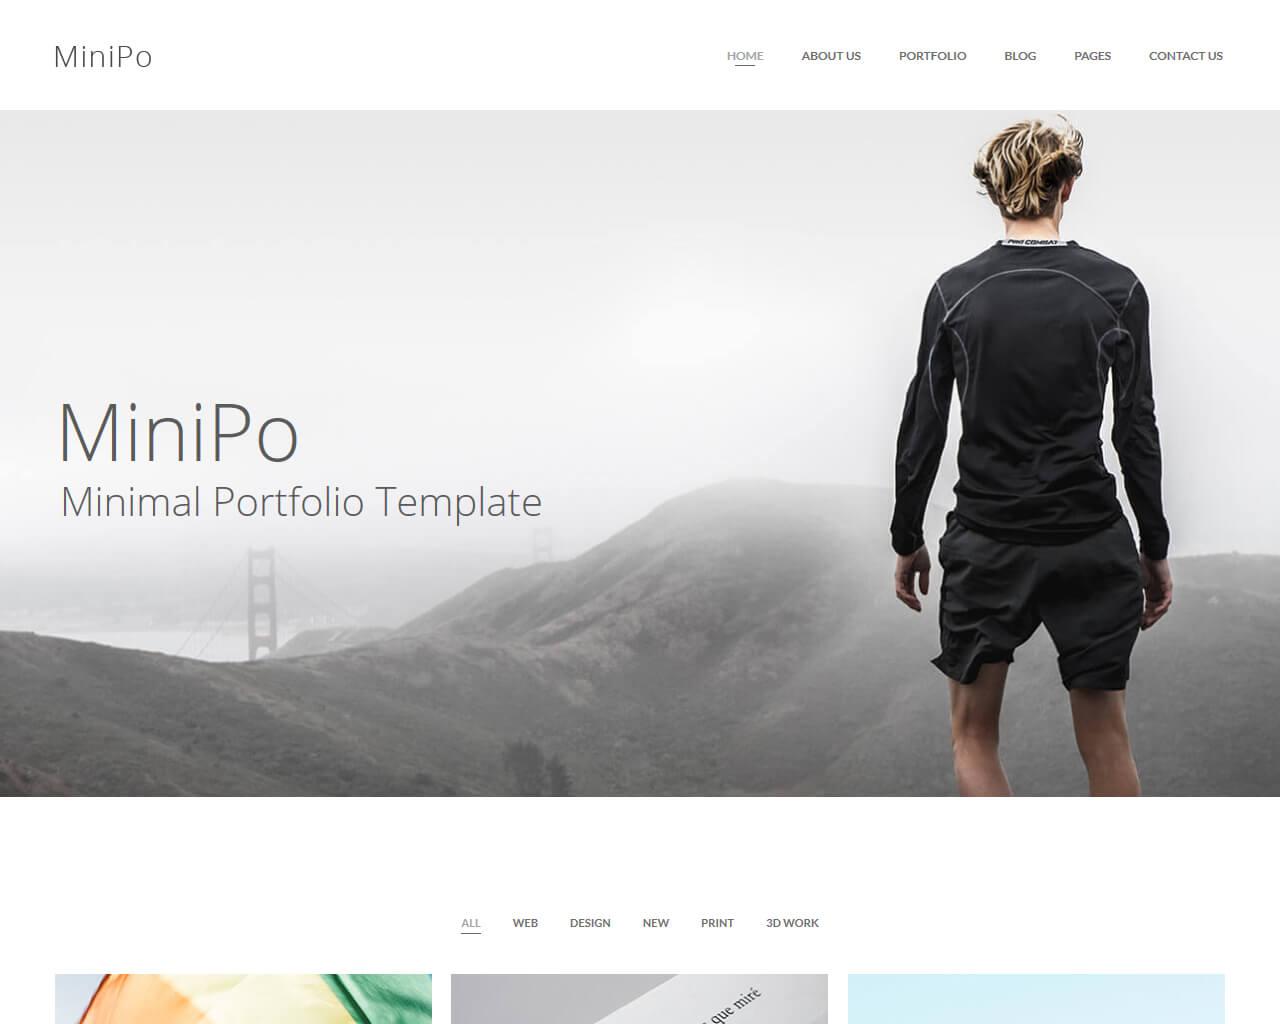 MiniPo Website Template